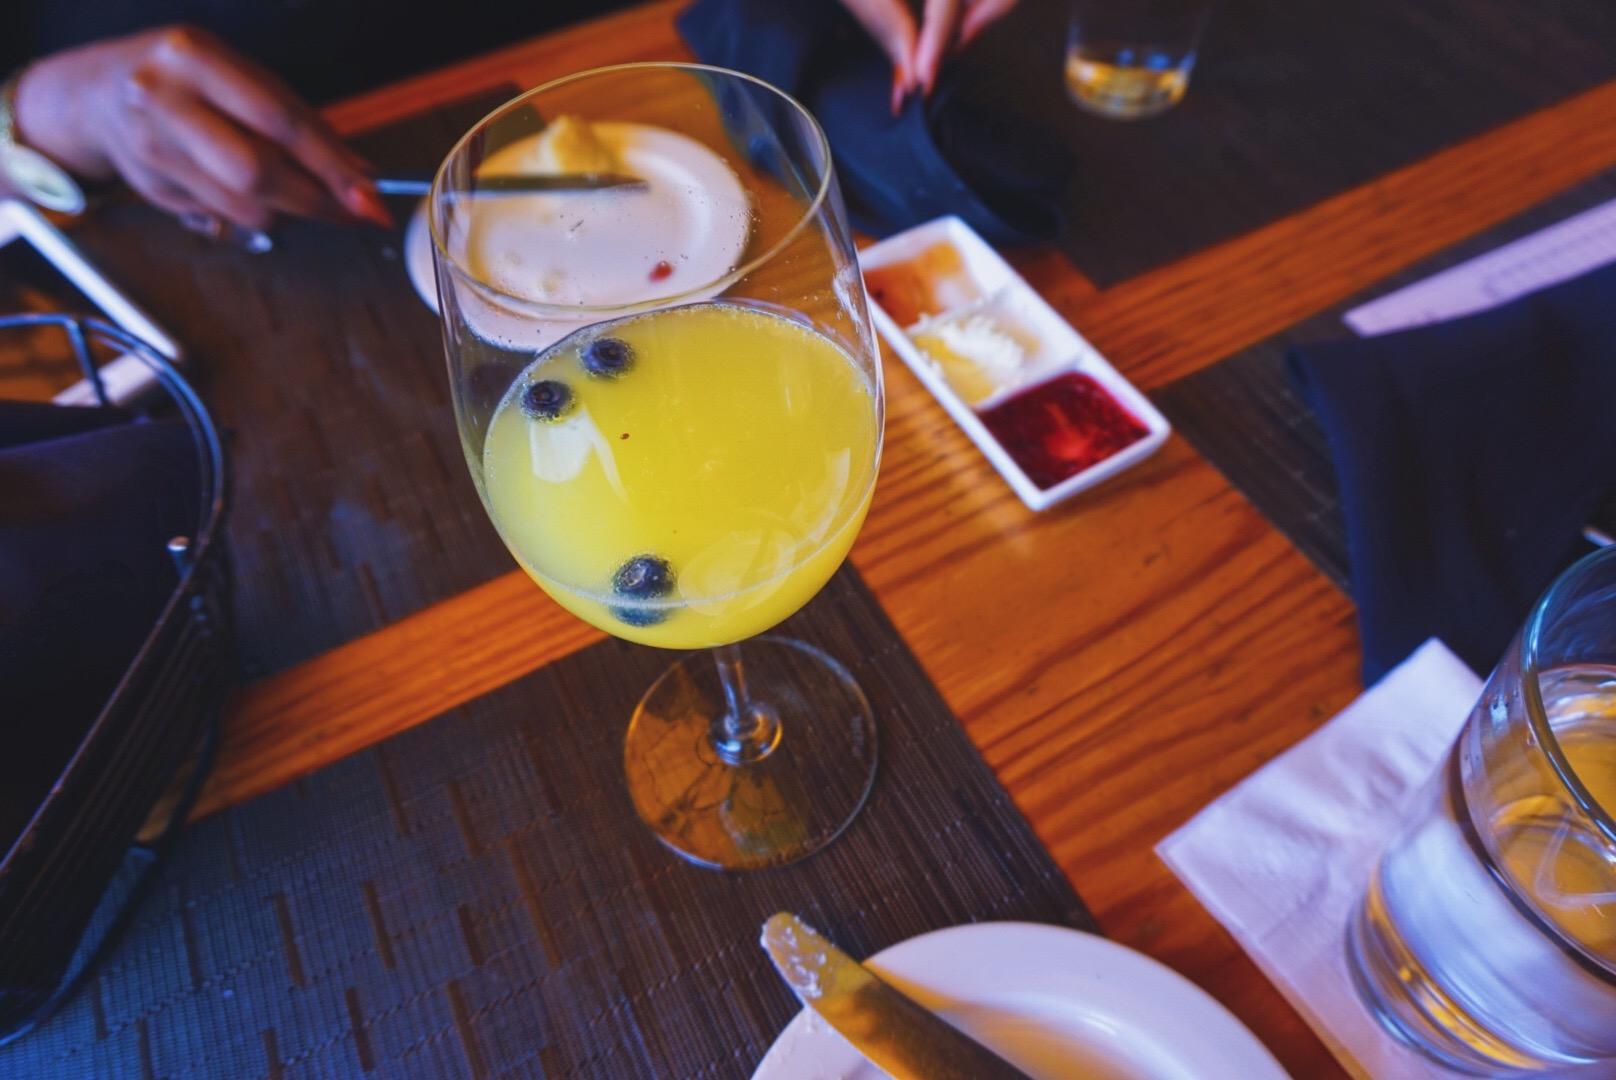 Blueberry Vodka Mimosa from Murphy's in Midtown Atlanta